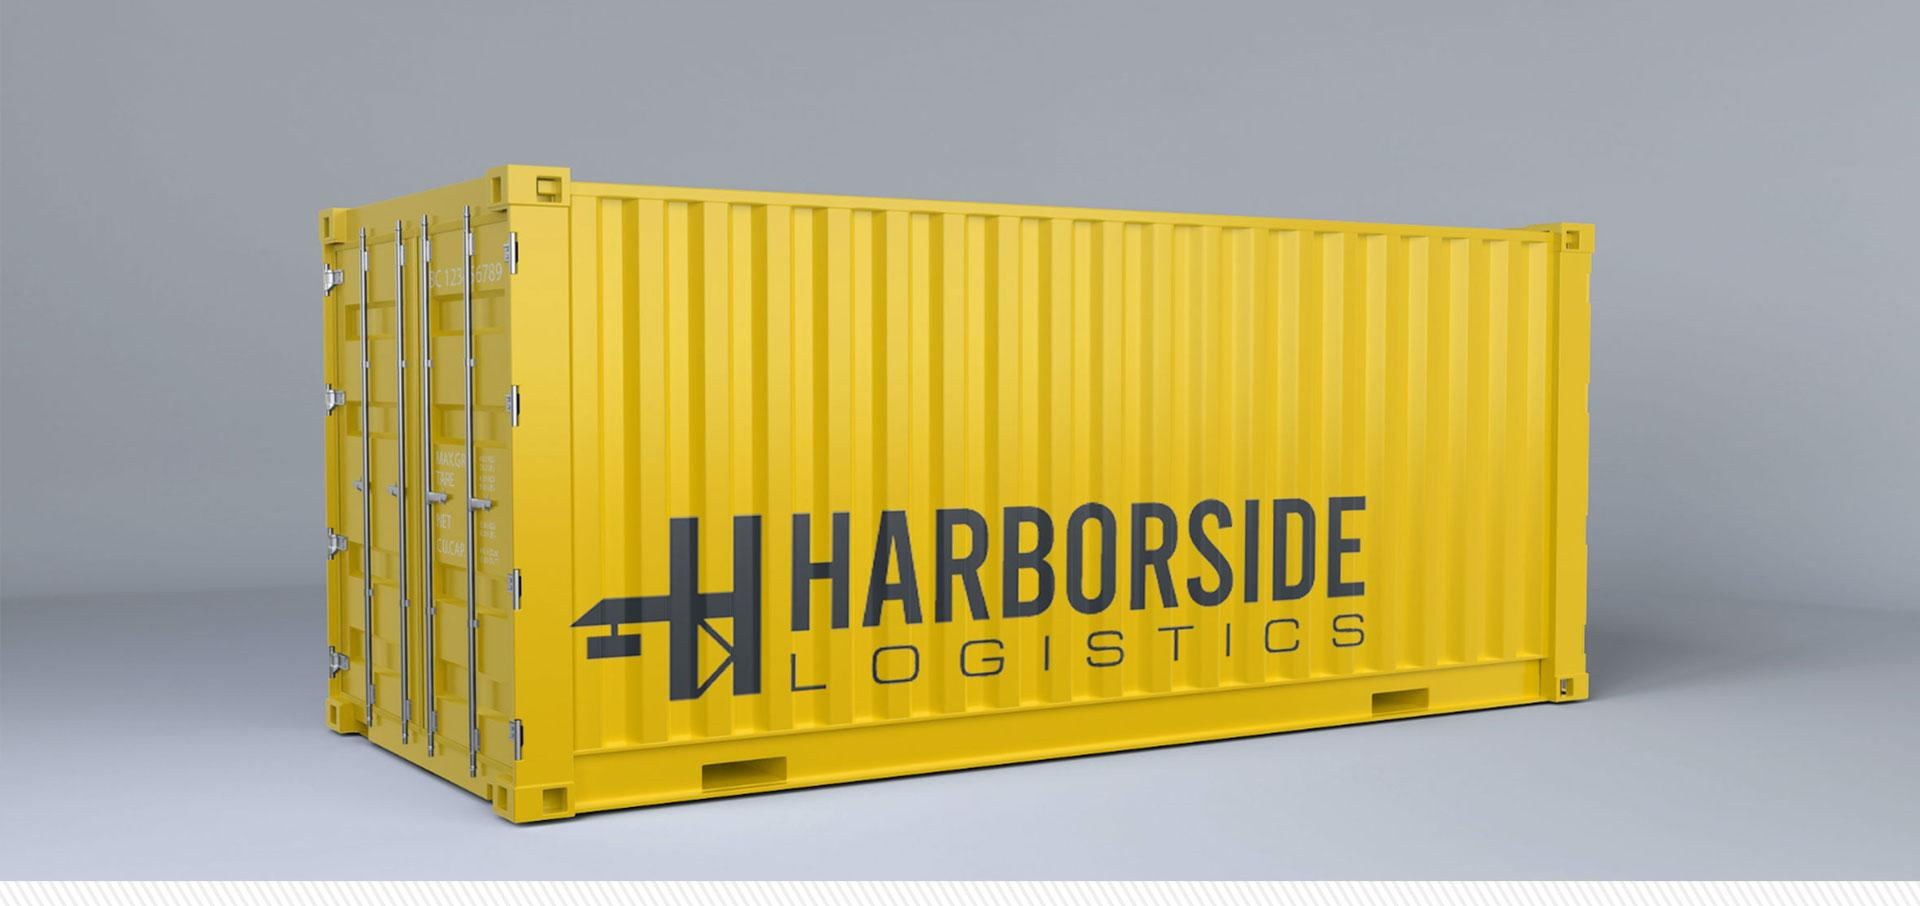 harborside-logistics-3